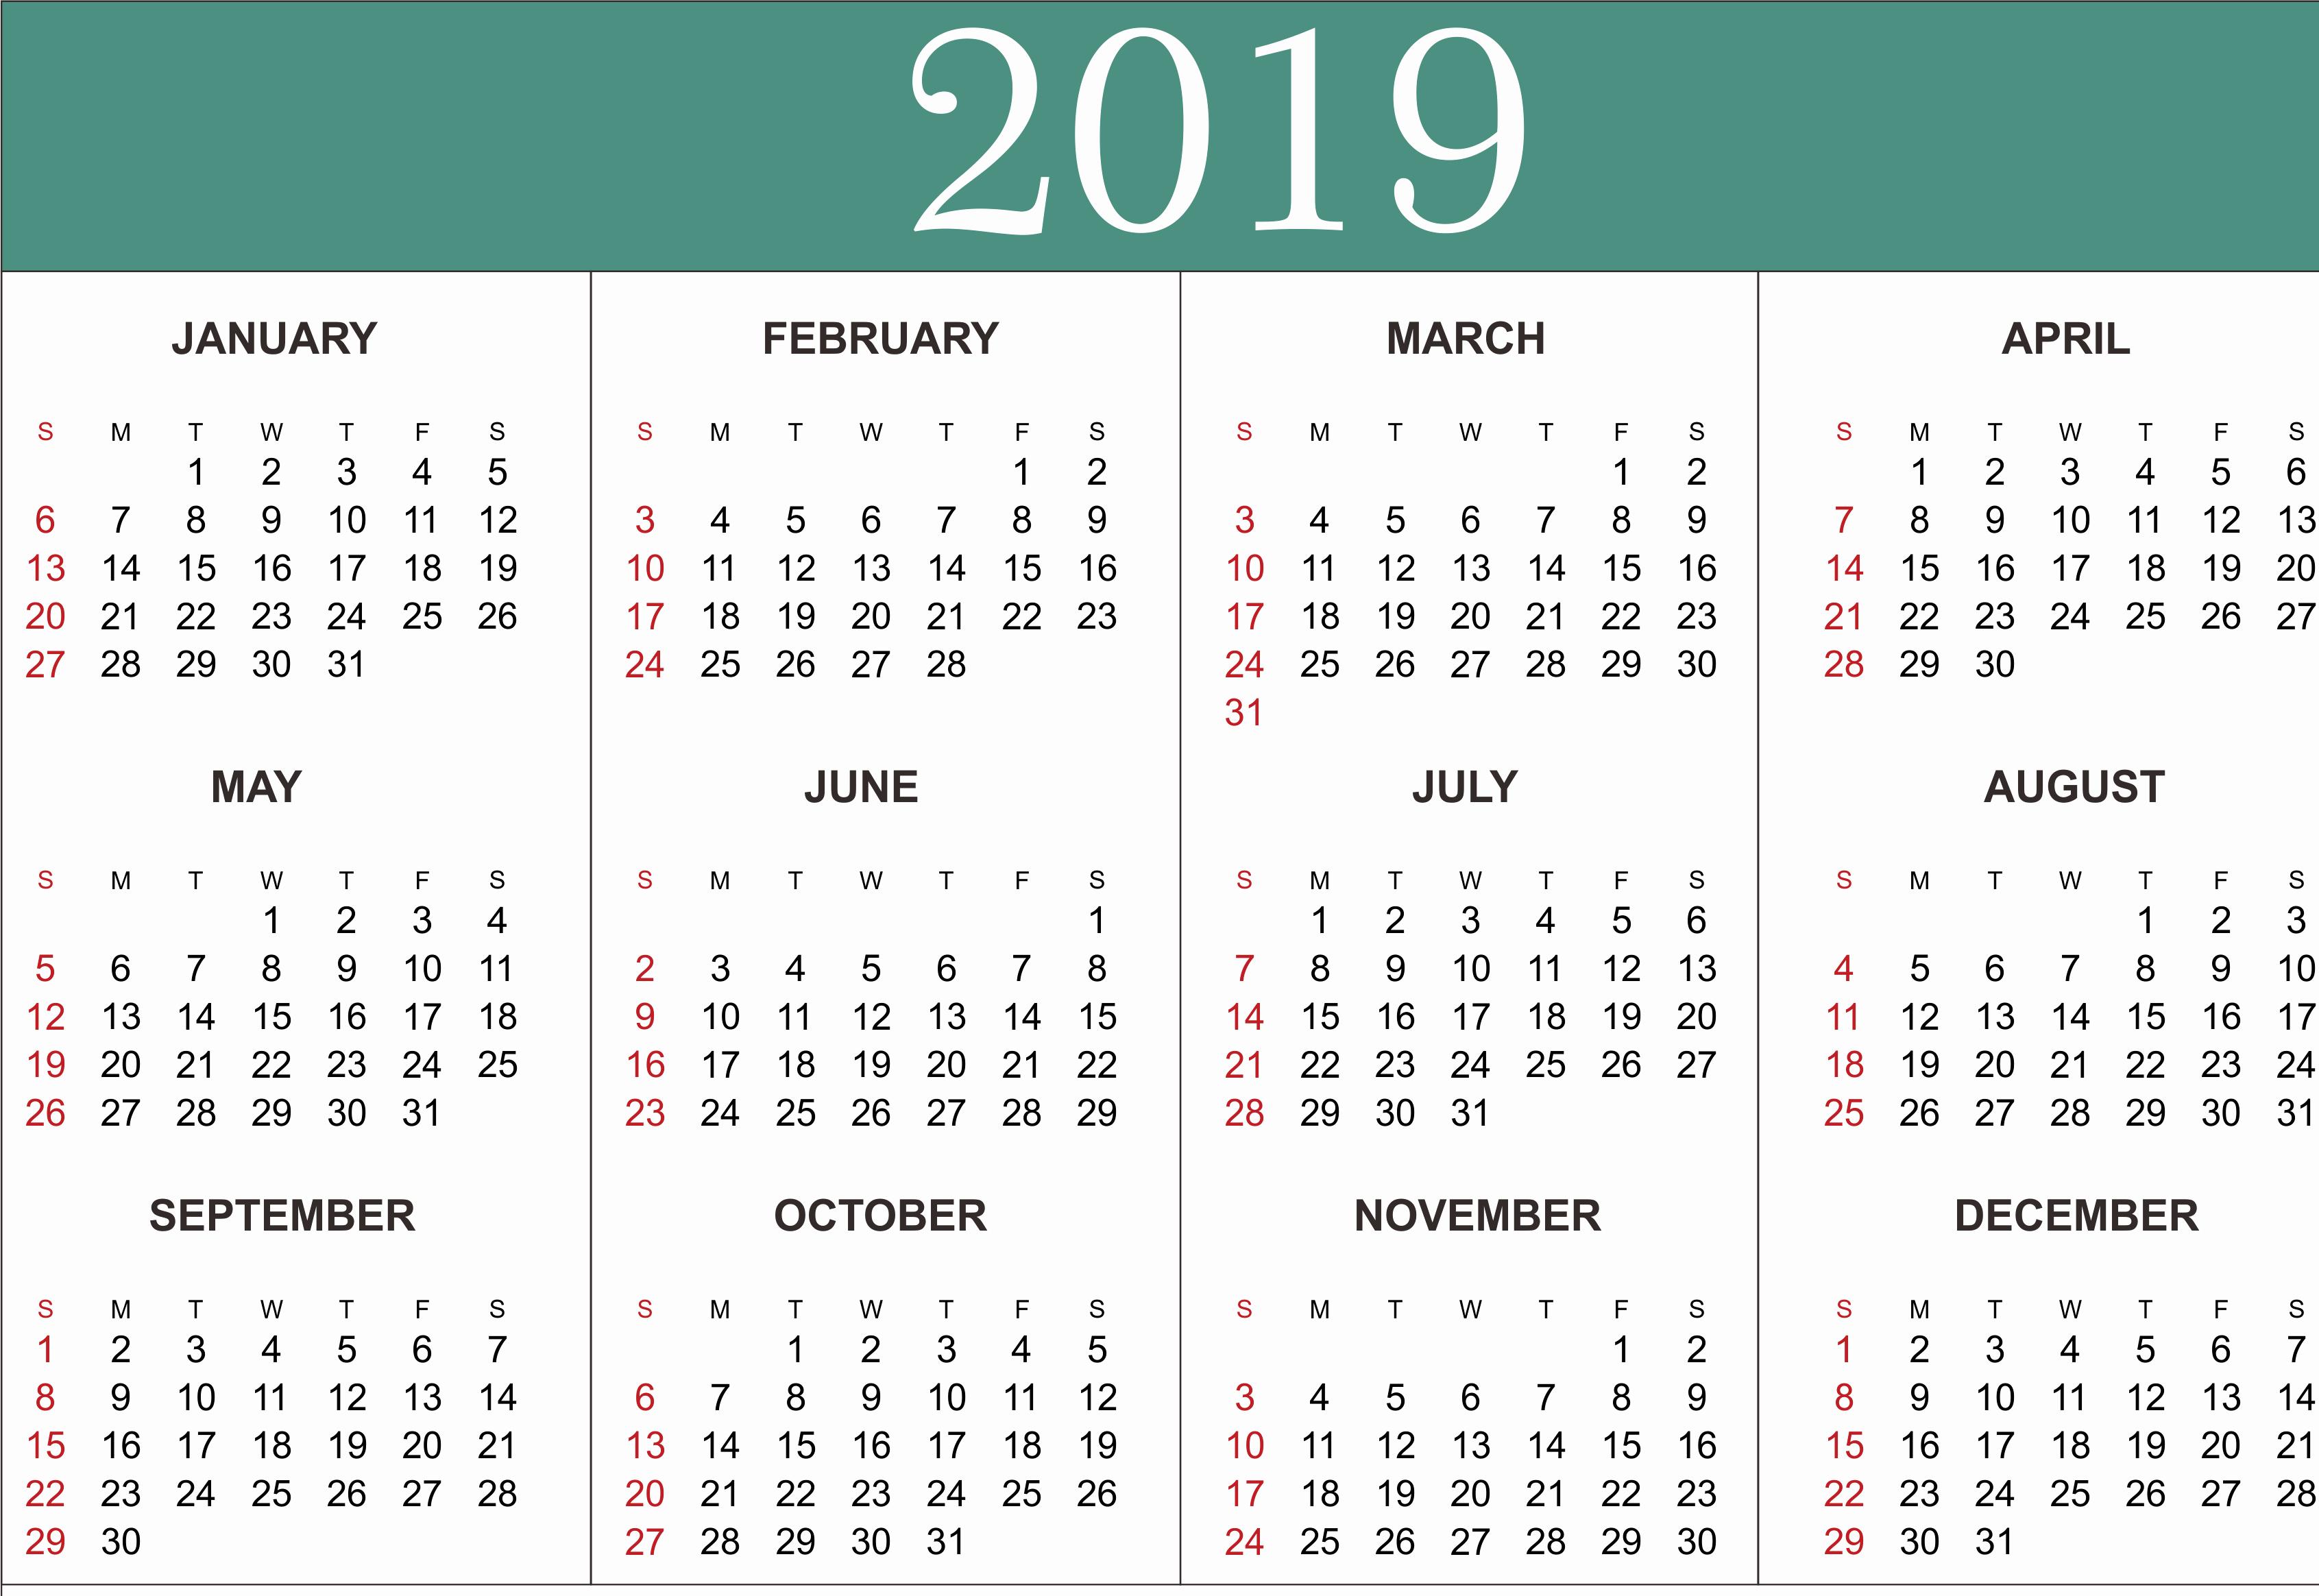 Microsoft Office Calendar Templates 2019 Elegant Free Yearly Calendar 2019 Printable Blank Templates